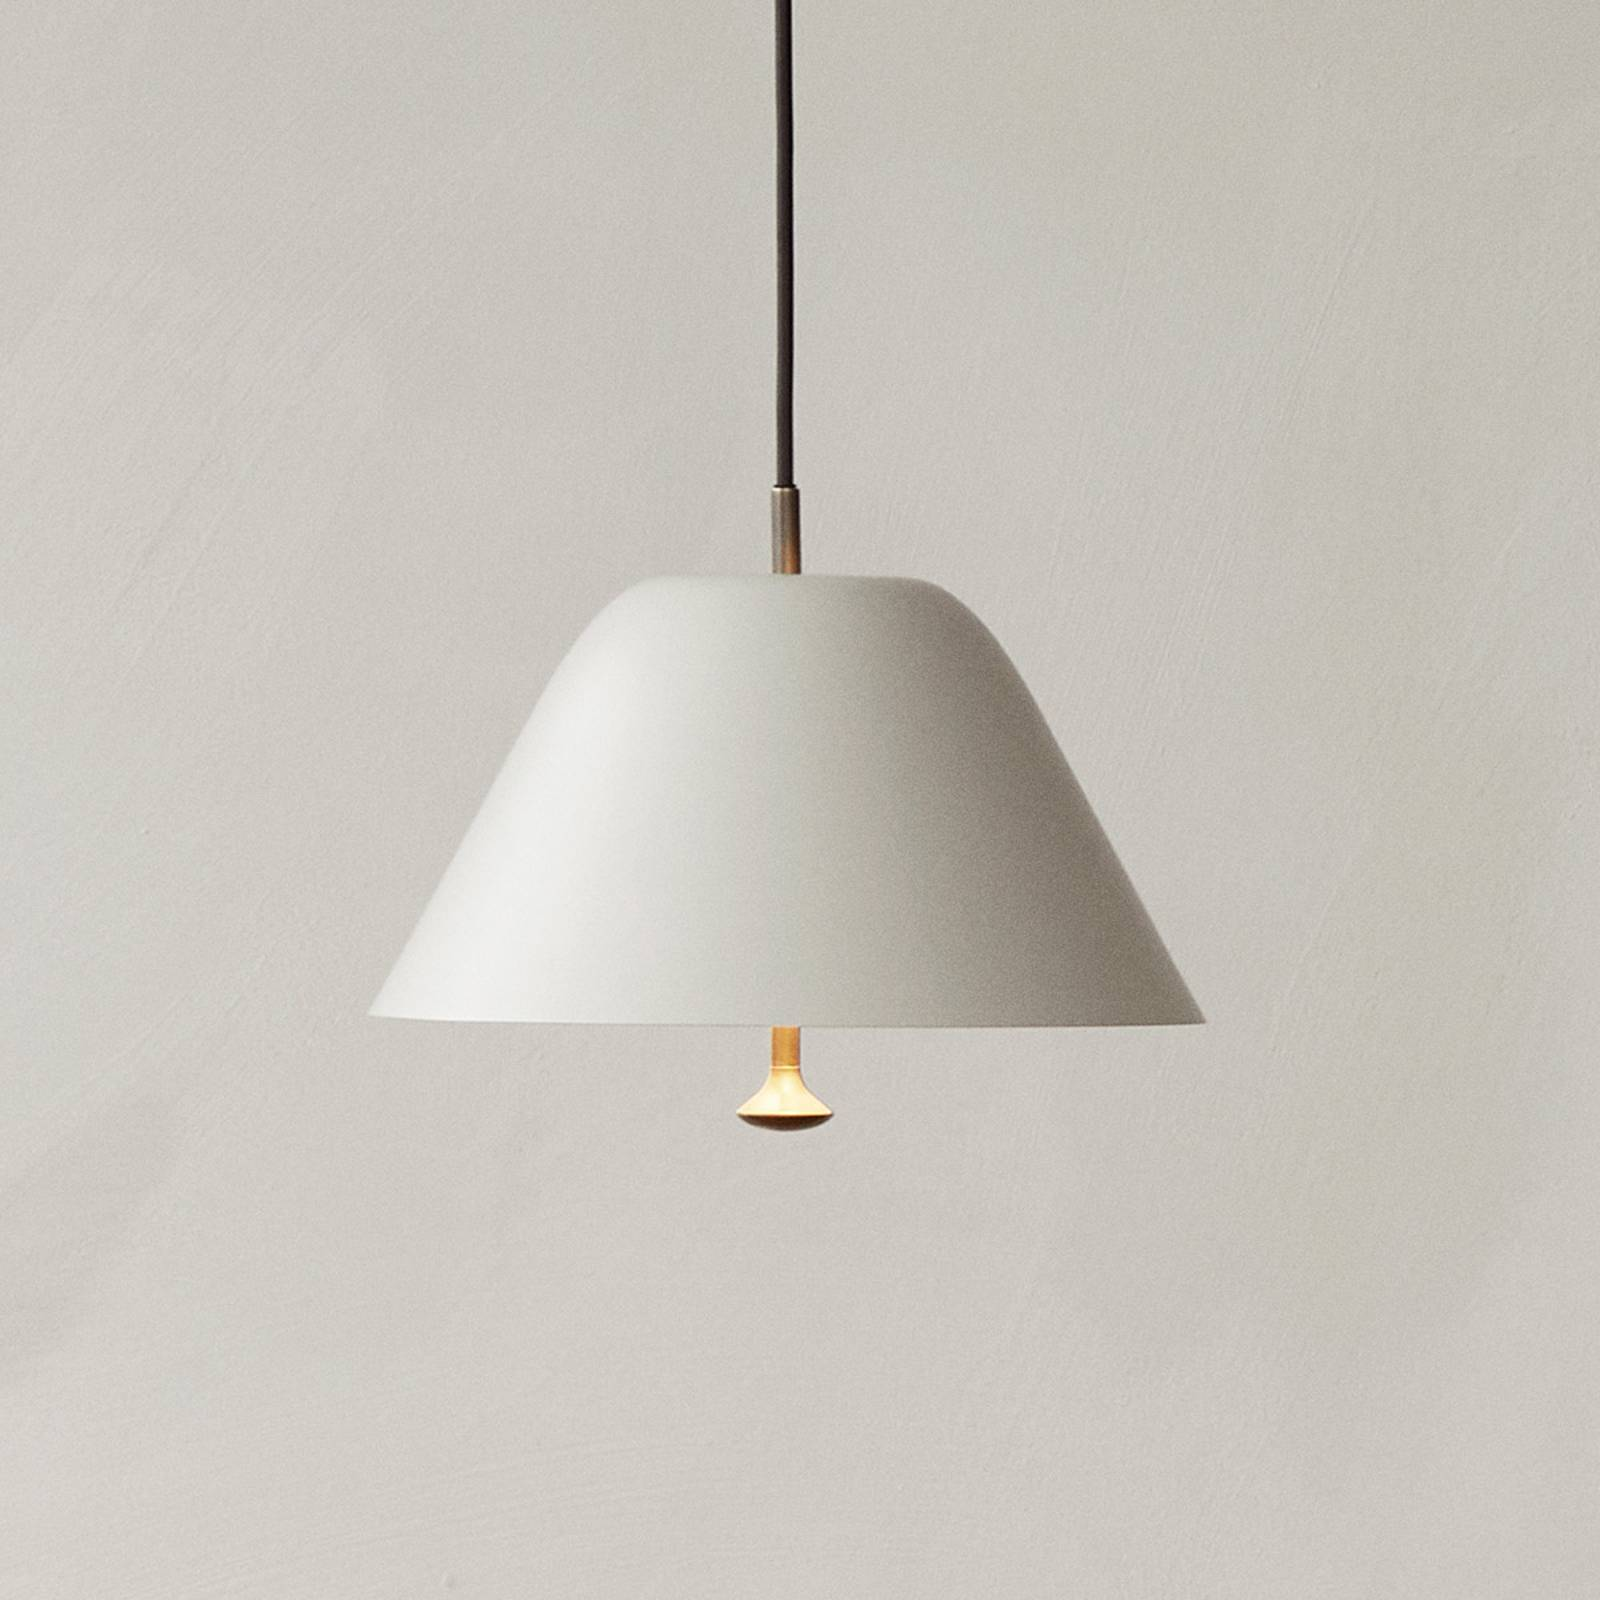 Menu Levitate hanglamp Ø 28 cm lichtgrijs